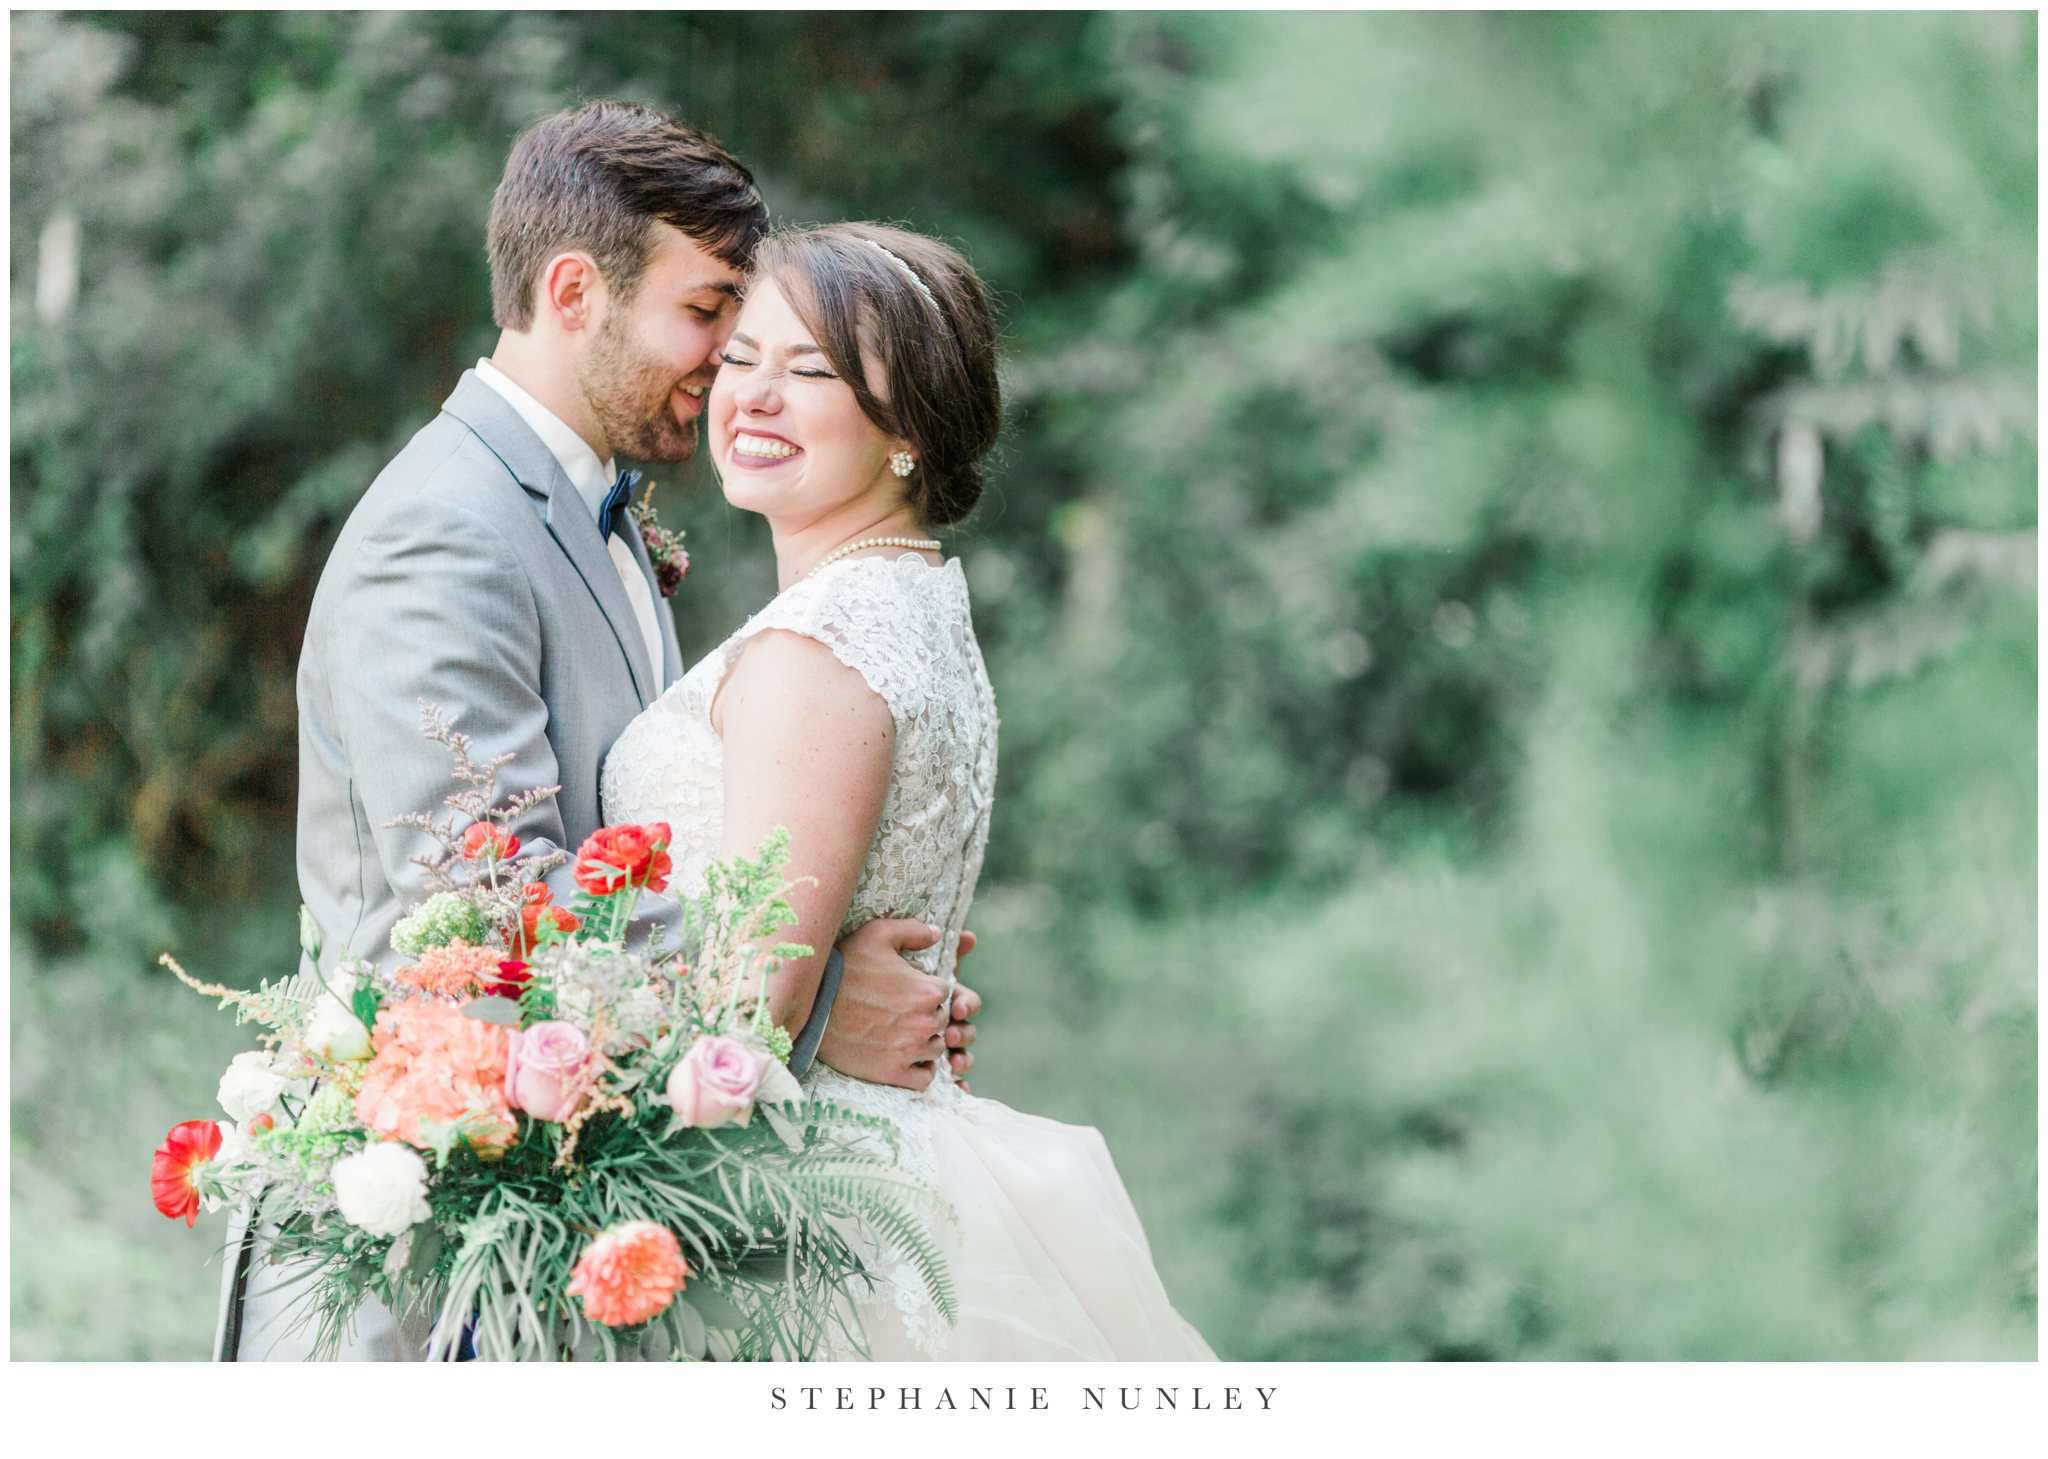 arkansas-wedding-with-lush-wildflower-bouquet-0121.jpg